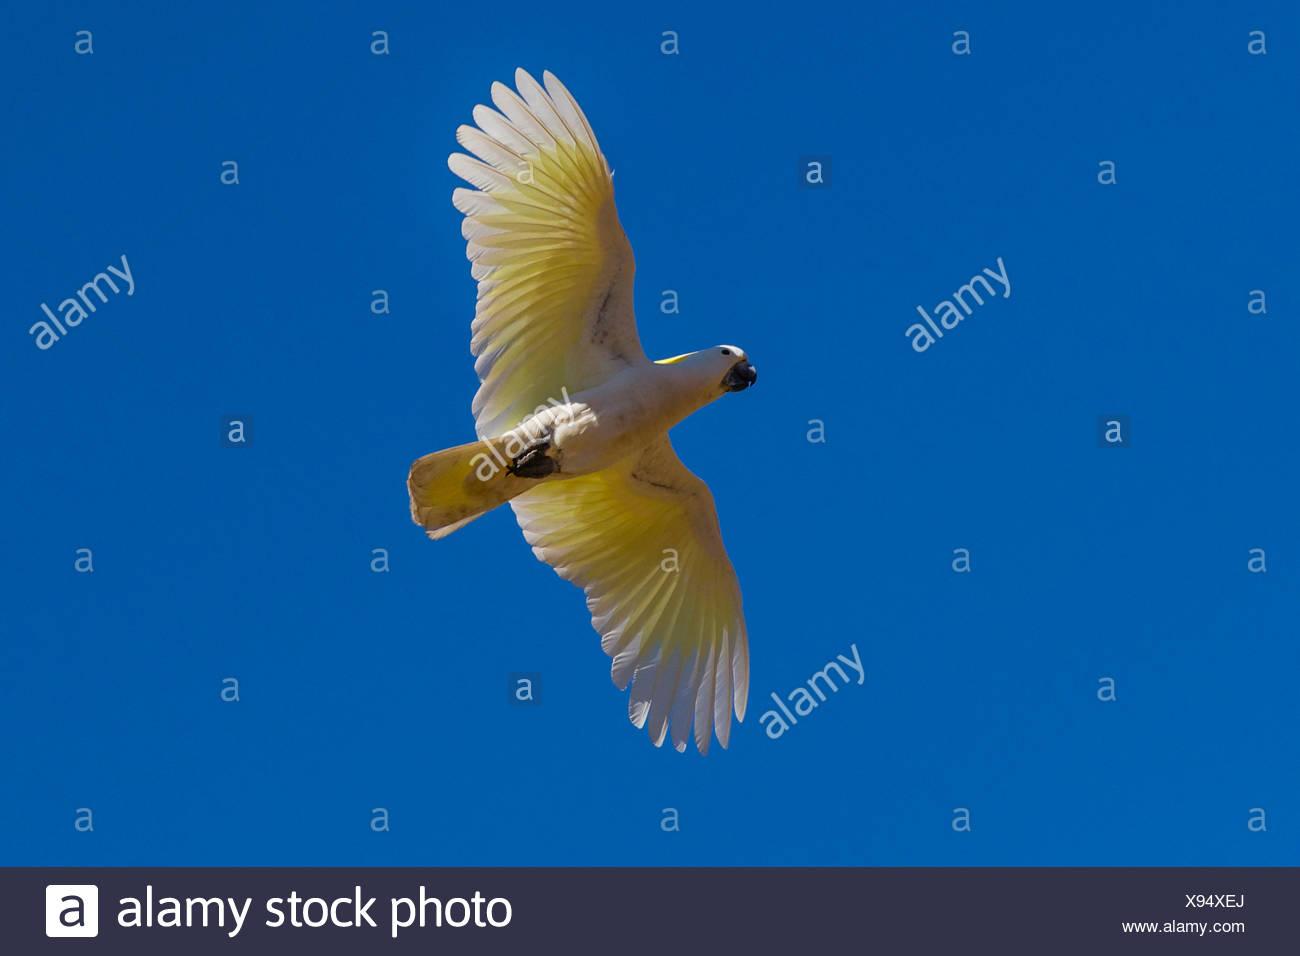 A Sulpher-crested Cockatoo (Cacatua galerita) in flight near Ord River in the Kimberley Region of Northwest Australia. - Stock Image